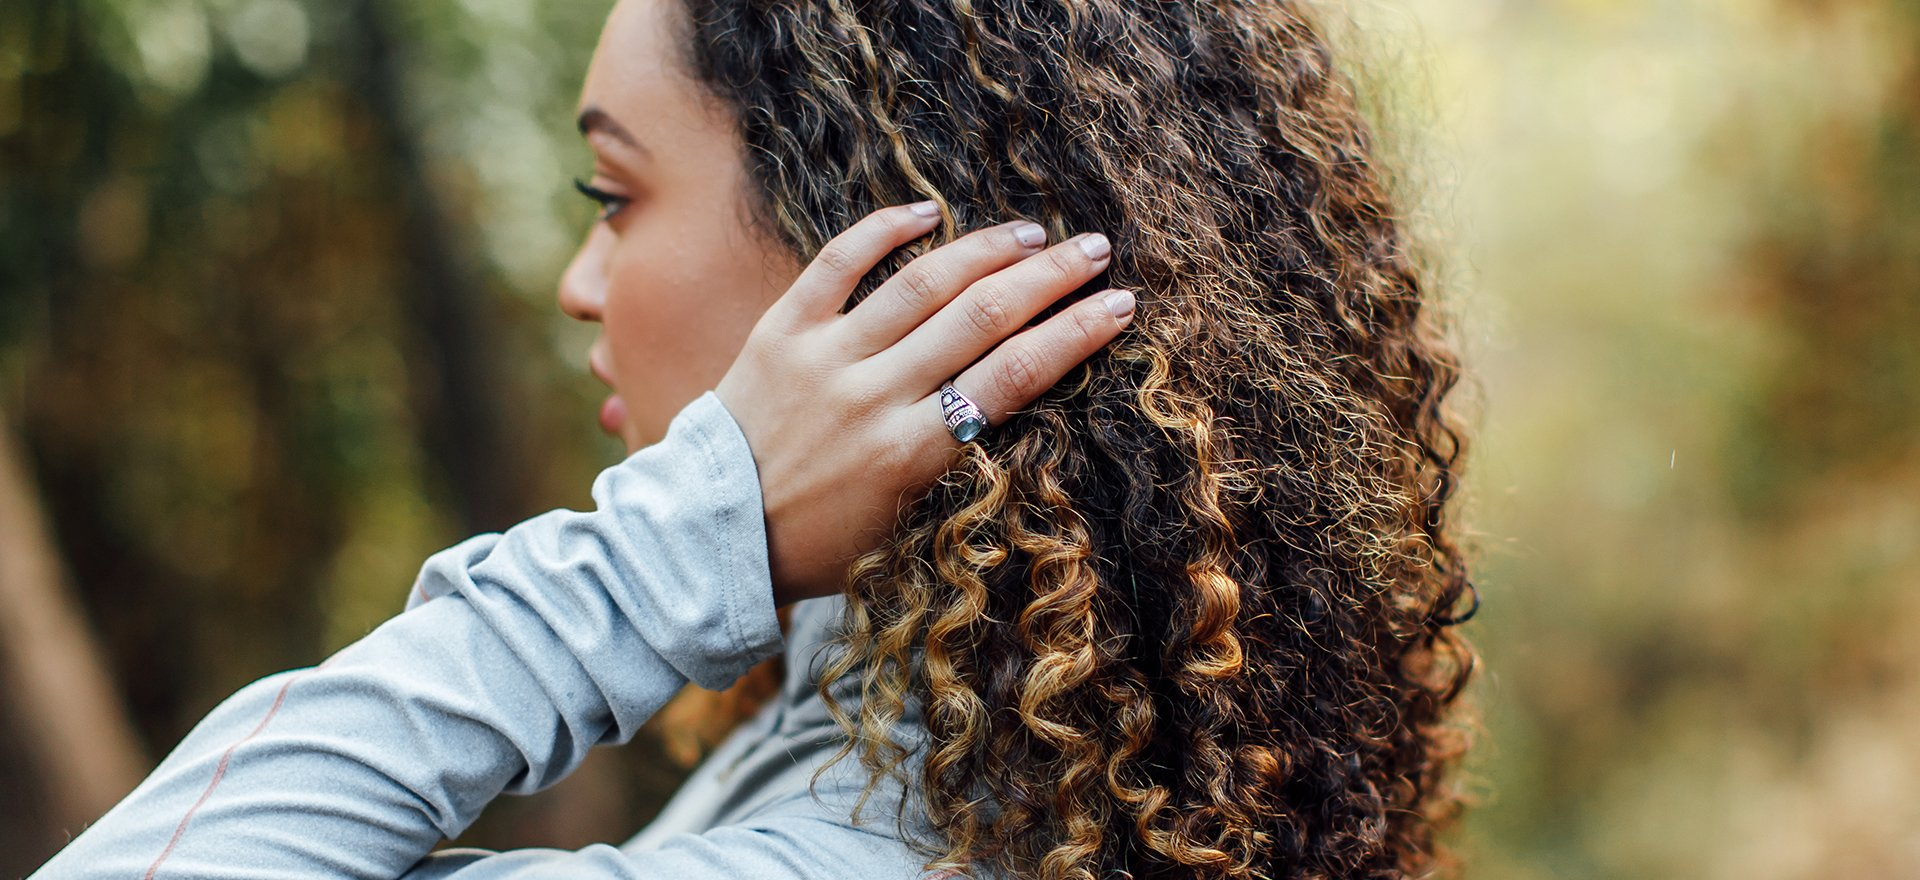 girl wearing achiever ring